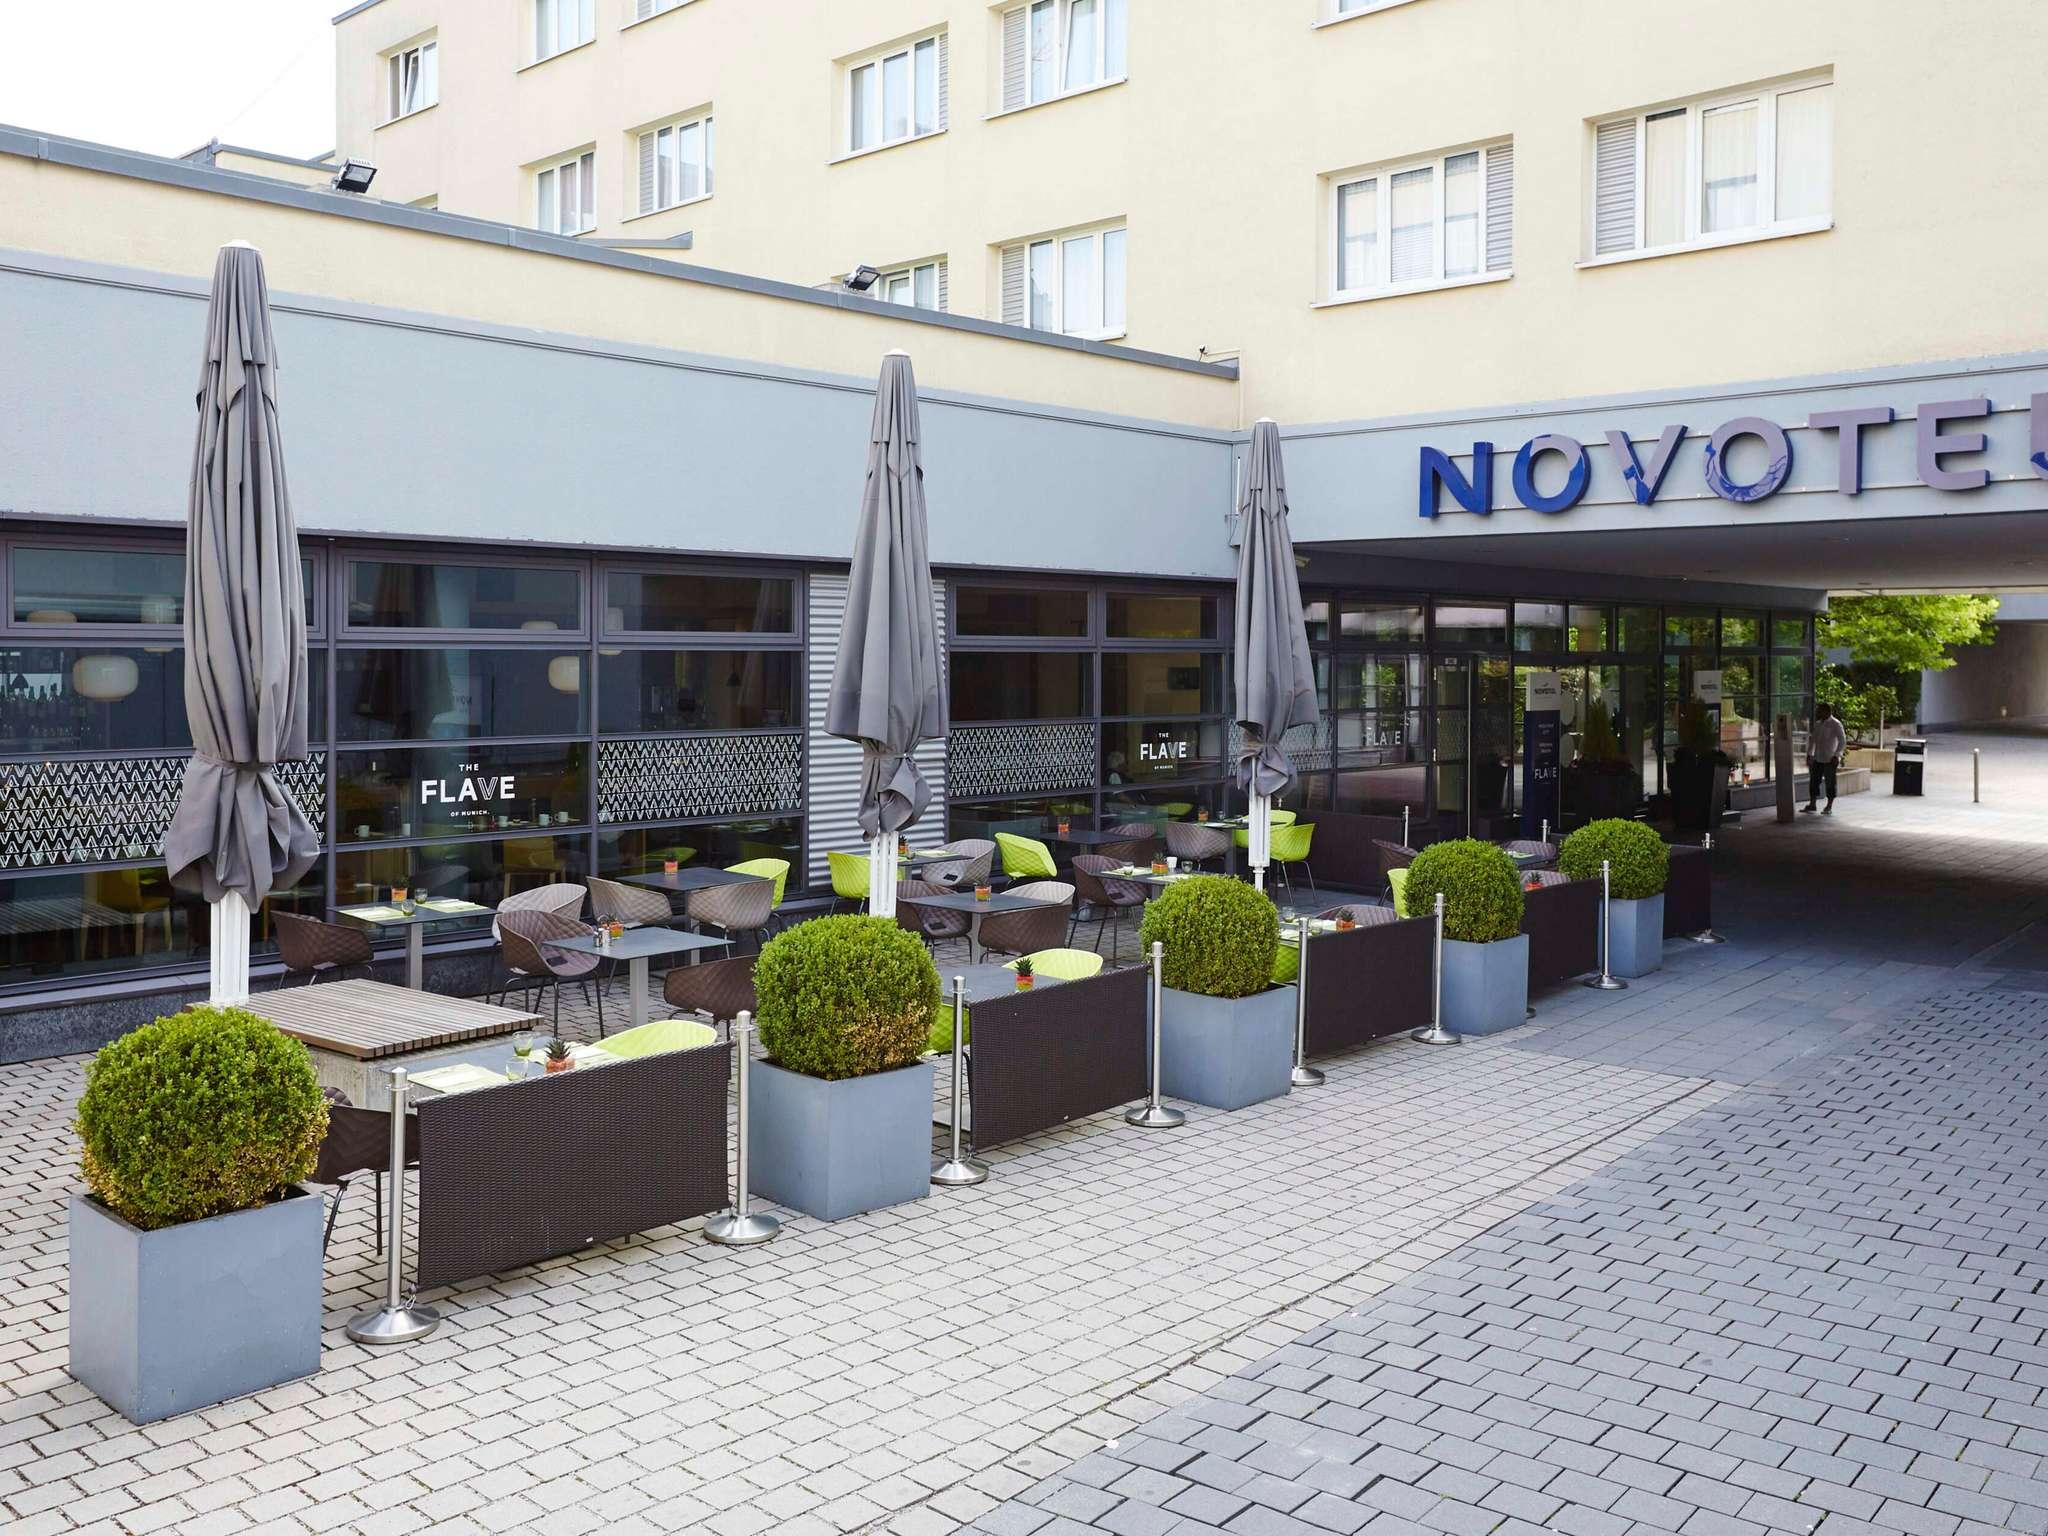 Hotell – Novotel München City